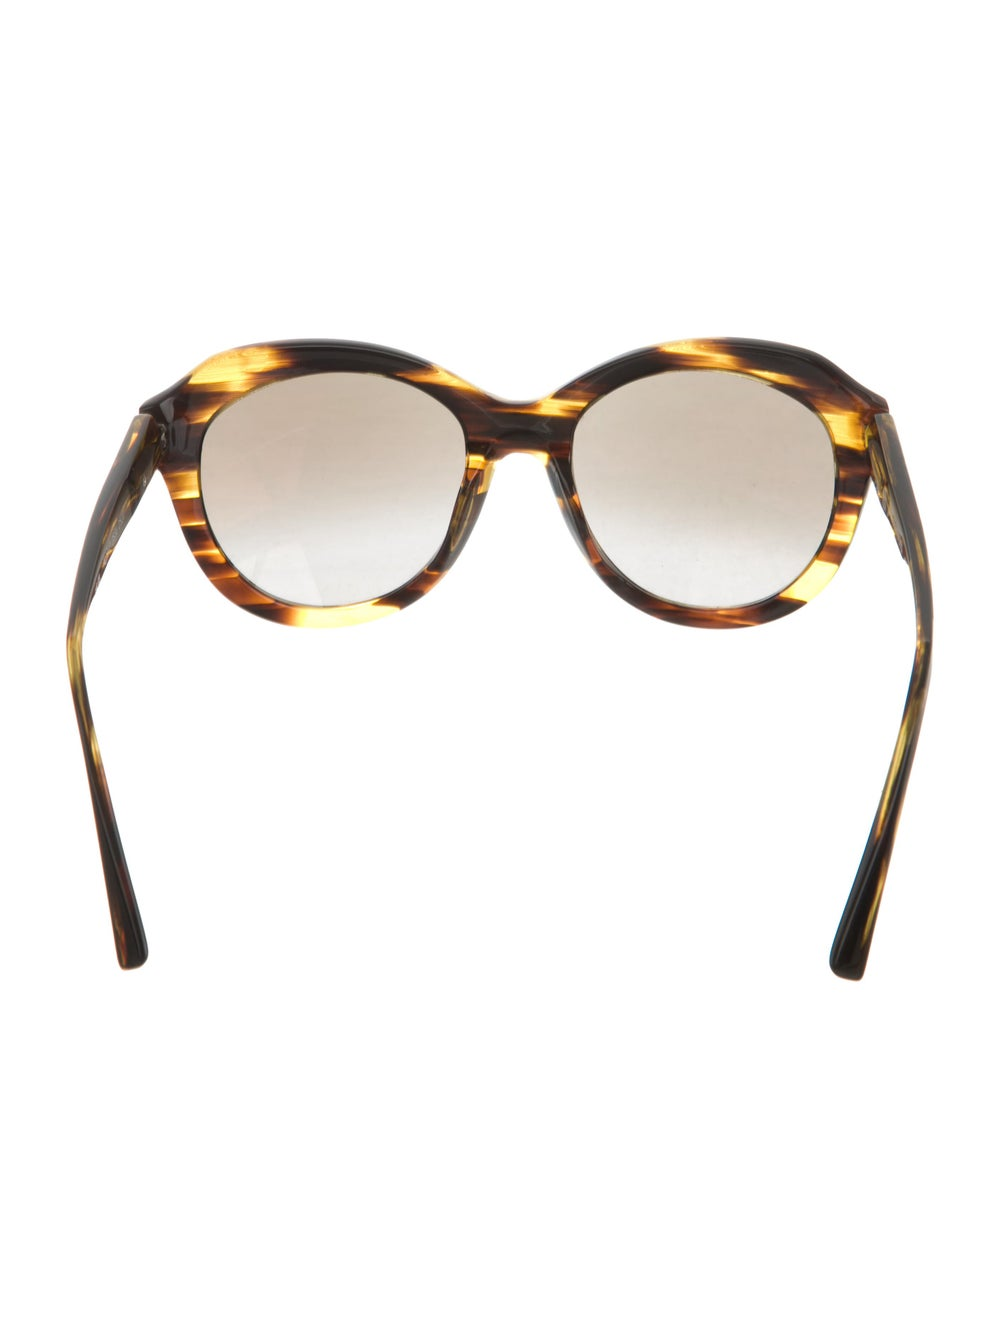 Alain Mikli Tortoiseshell Oversize Sunglasses - image 3